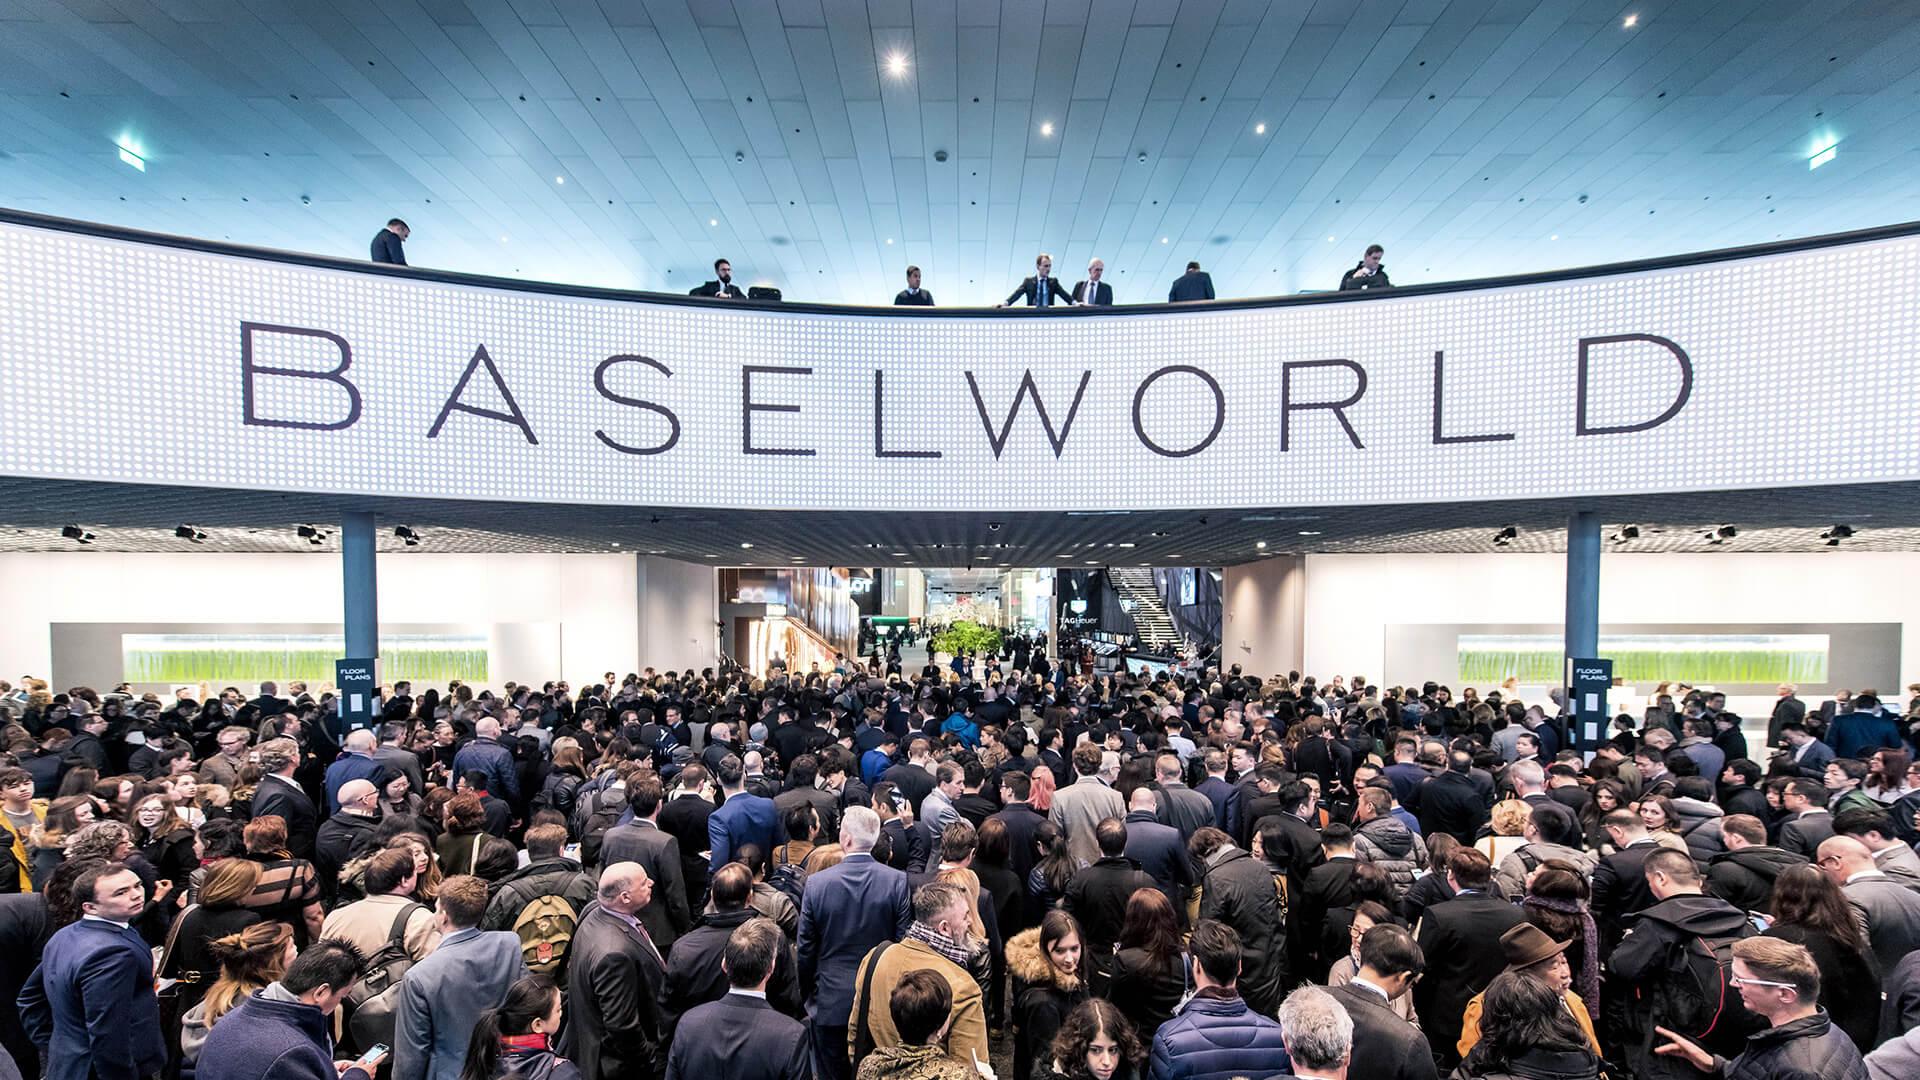 Coronavirus annullato anche Baselworld 2020